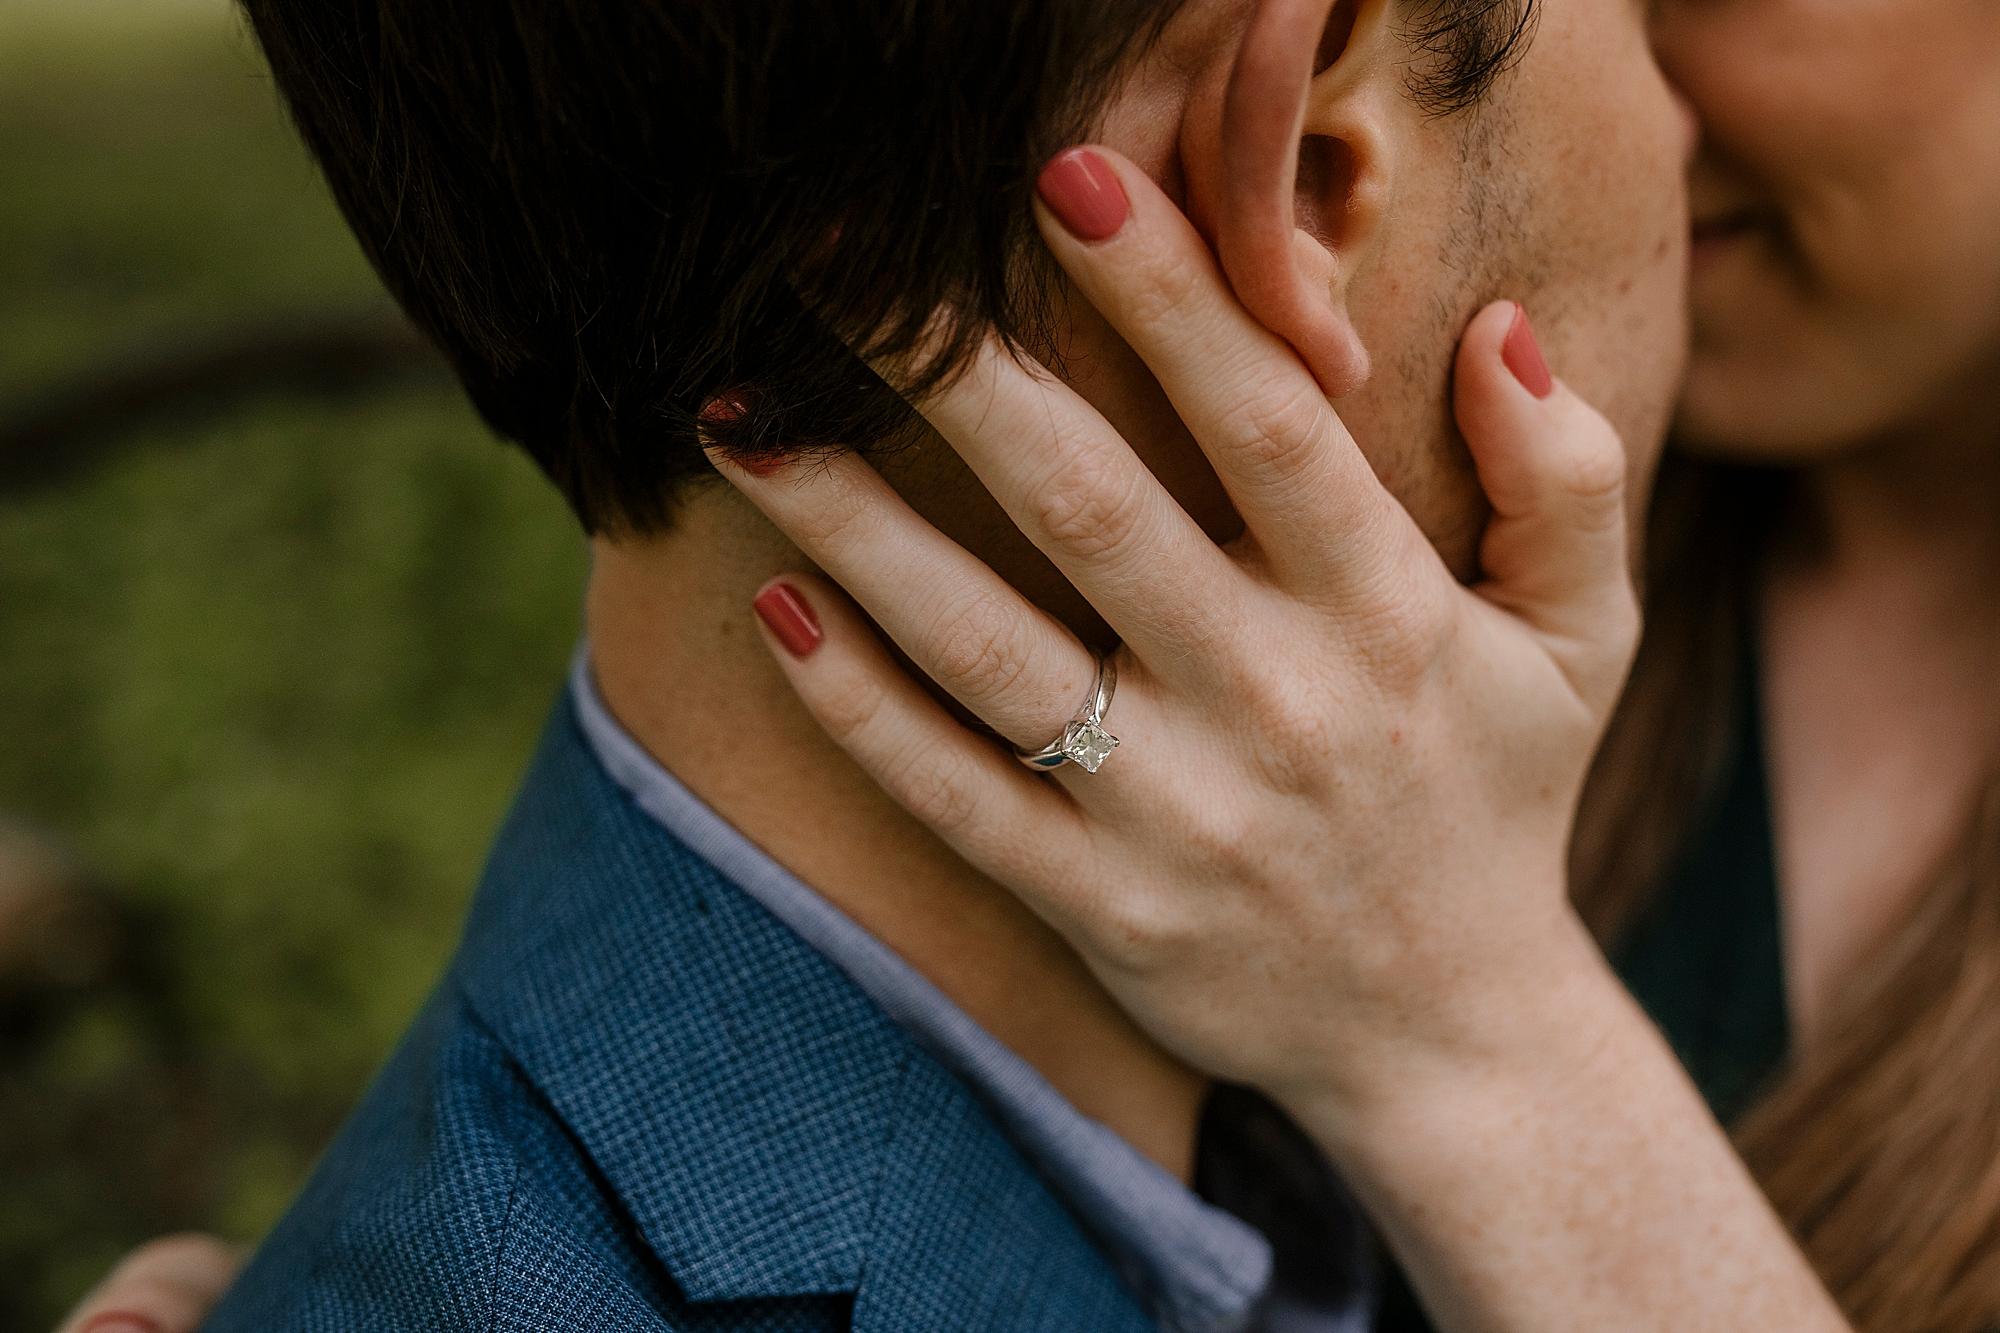 Tori_Zack_Glen_Mills_Terrain Cafe_Wedding_Engagement_Photography_Joe_Mac_Creative__0028.jpg